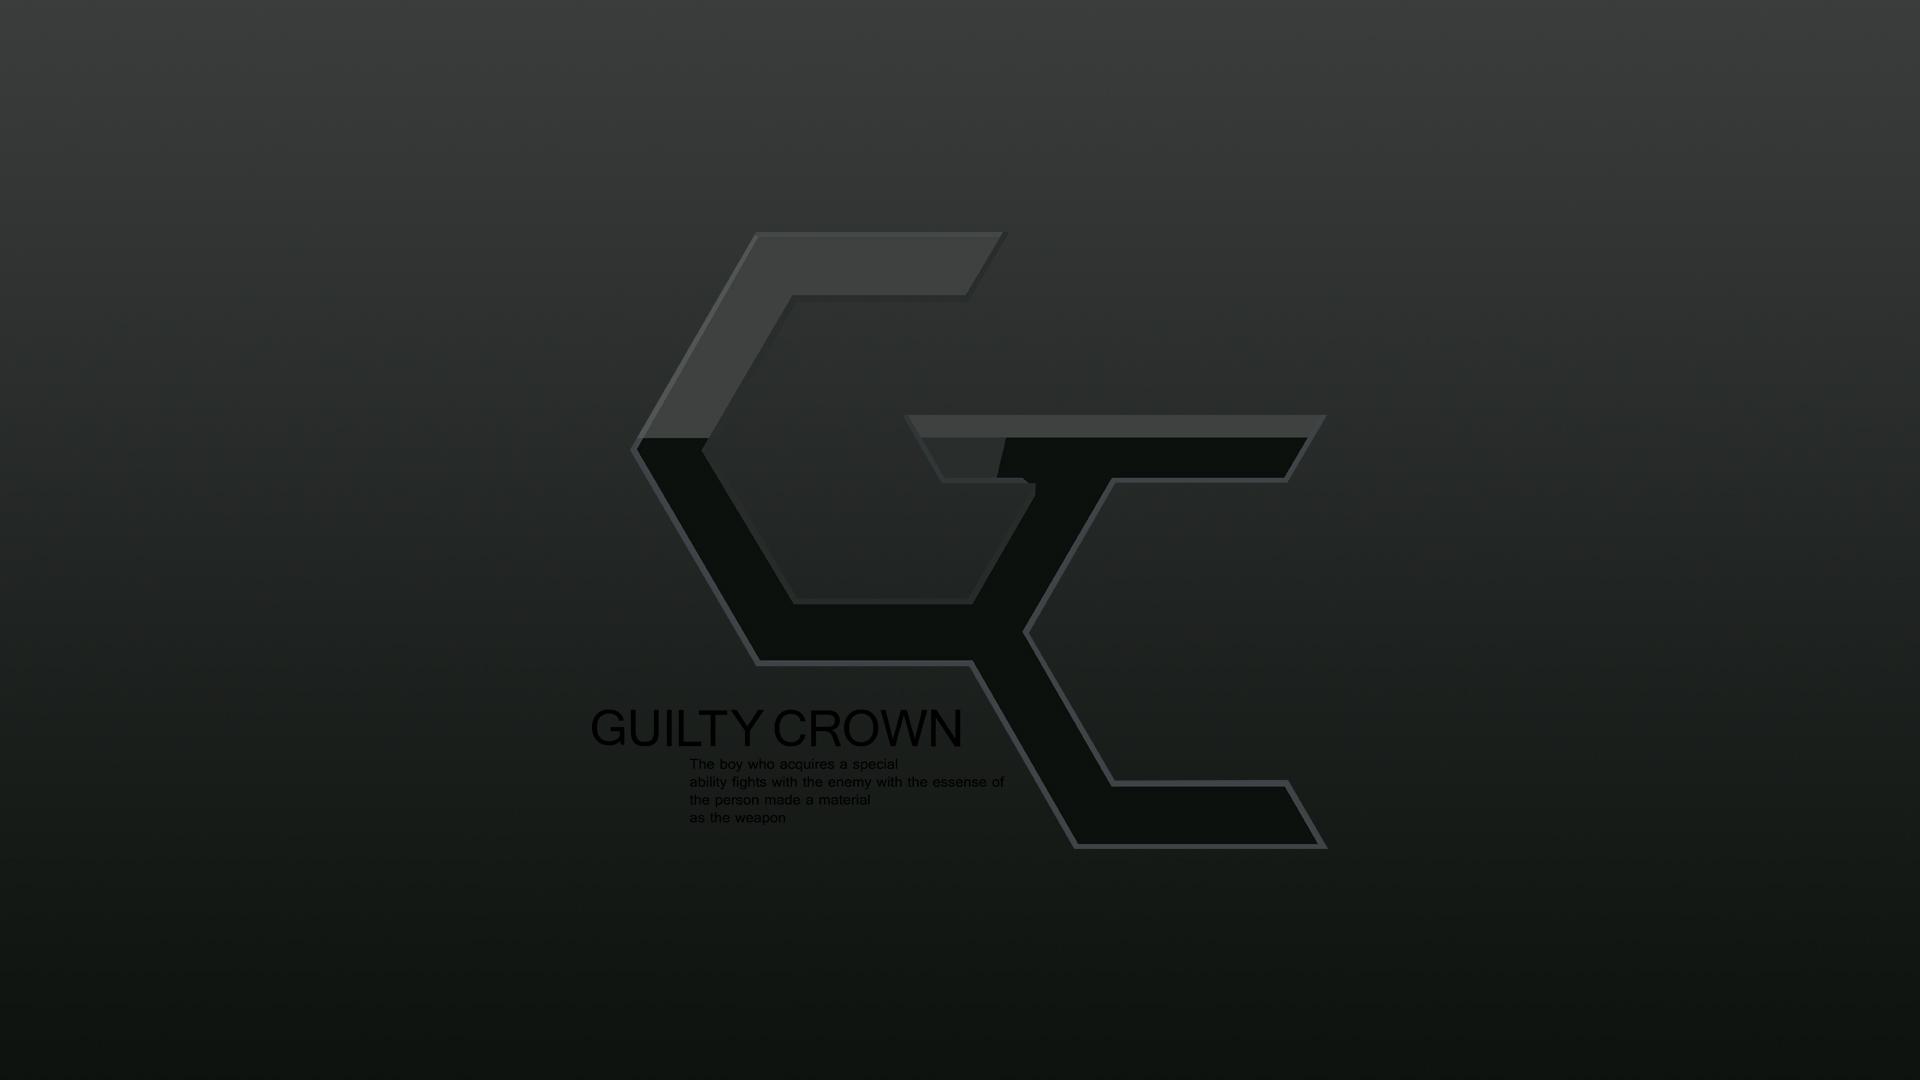 Guilty Crown Wallpaper 1920x1080 Guilty Crown 1920x1080